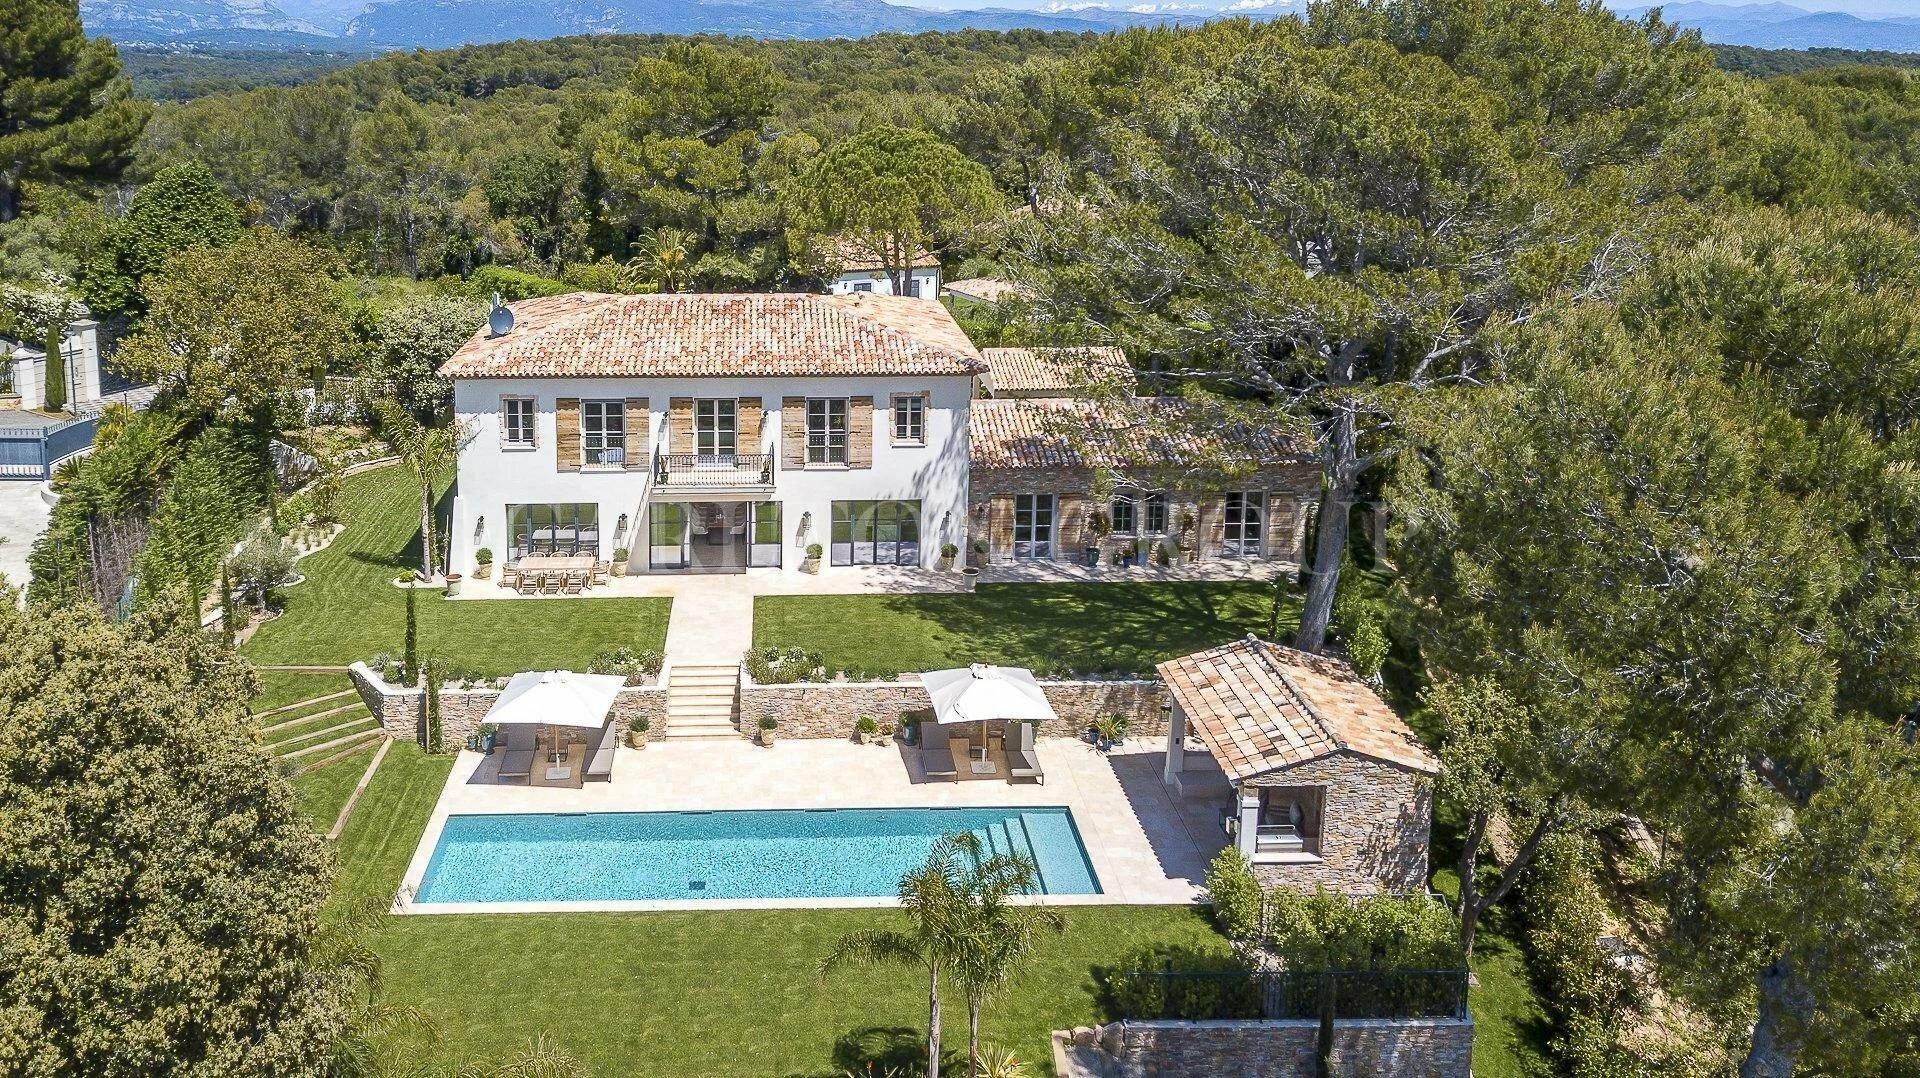 Villa in Mougins, Provence-Alpes-Côte d'Azur, France 1 - 11529756